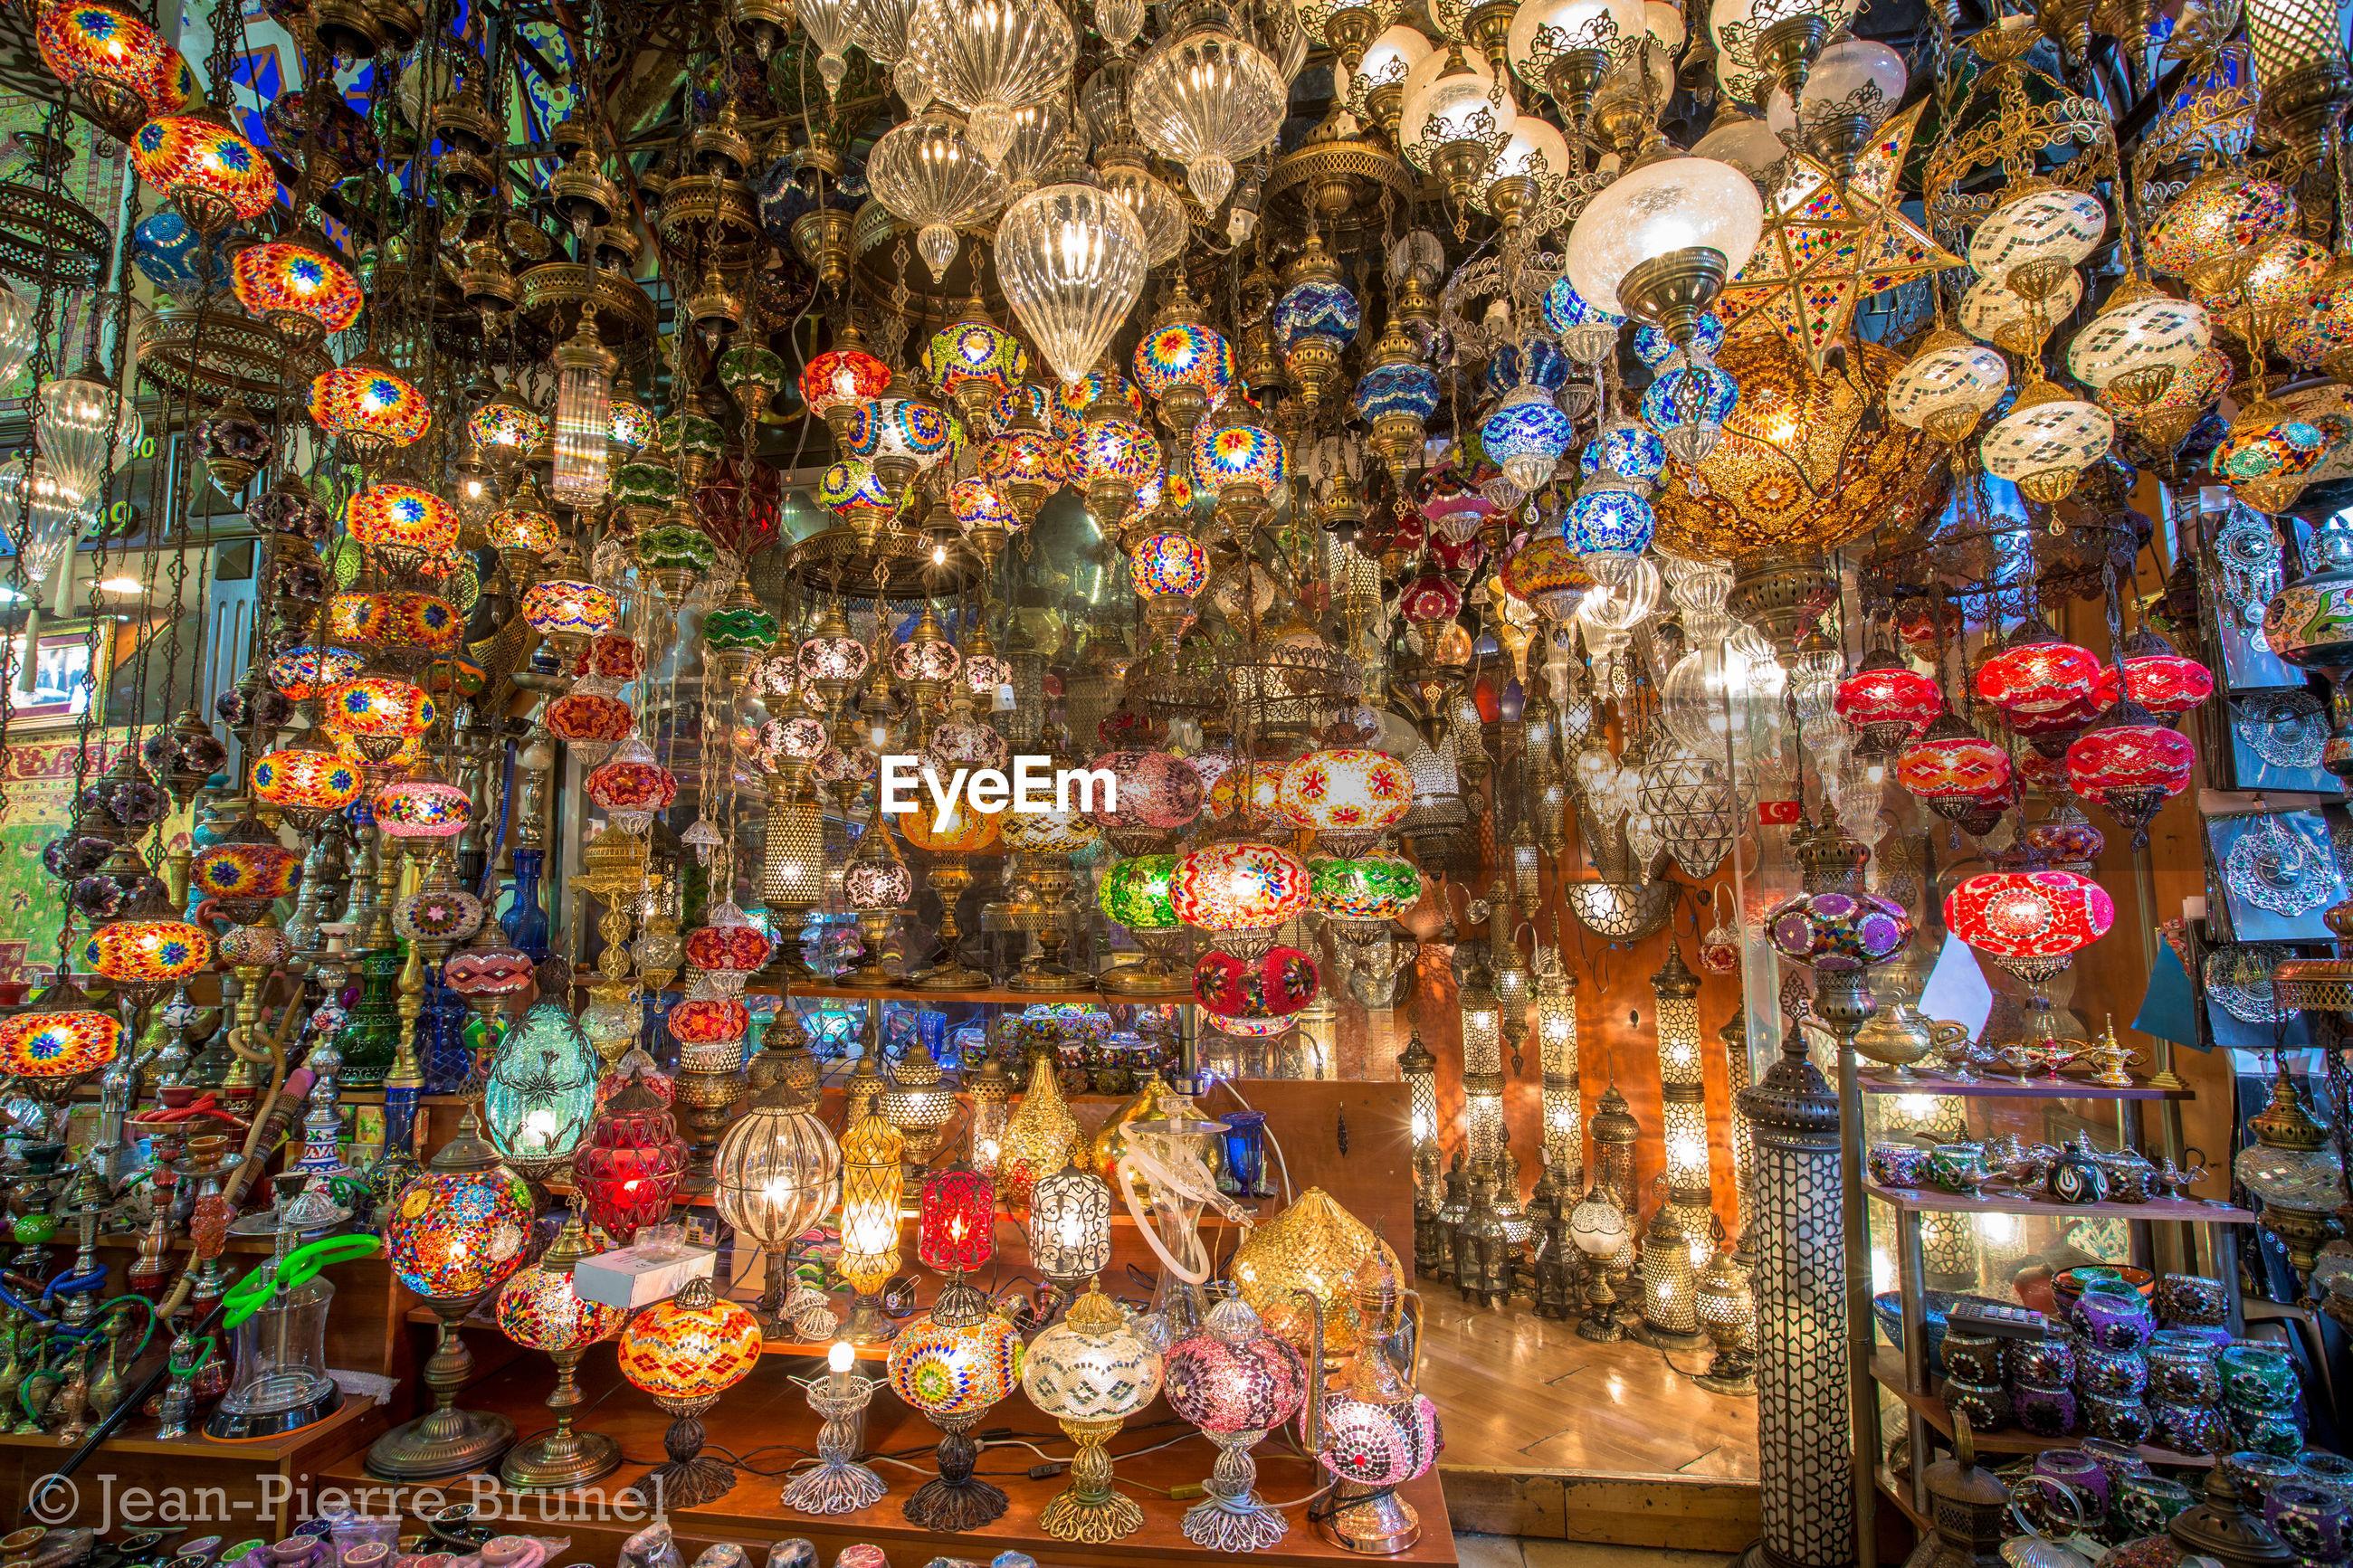 decoration, tree, built structure, illuminated, multi colored, lighting equipment, art, cultures, no people, ornate, decor, abundance, growth